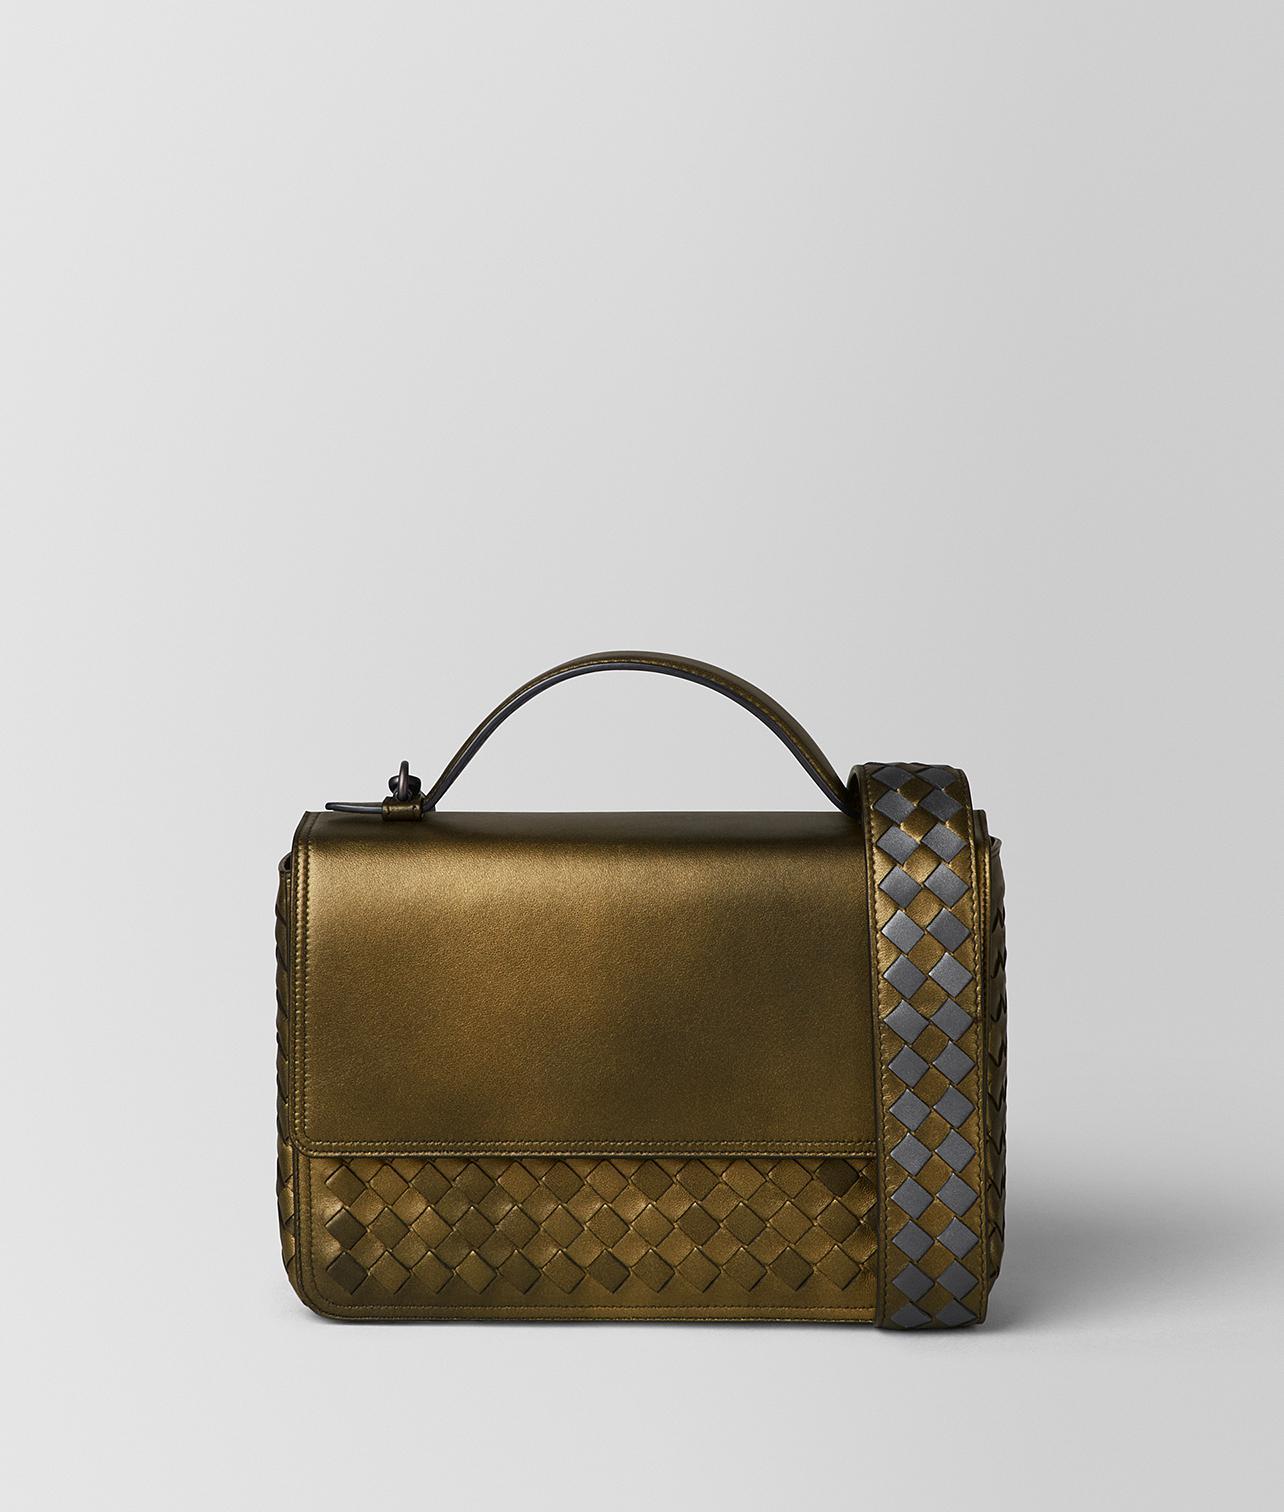 27ac0cc9d8e6 Lyst - Bottega Veneta Dark Gold Intrecciato Nappa Alumna Bag in Metallic